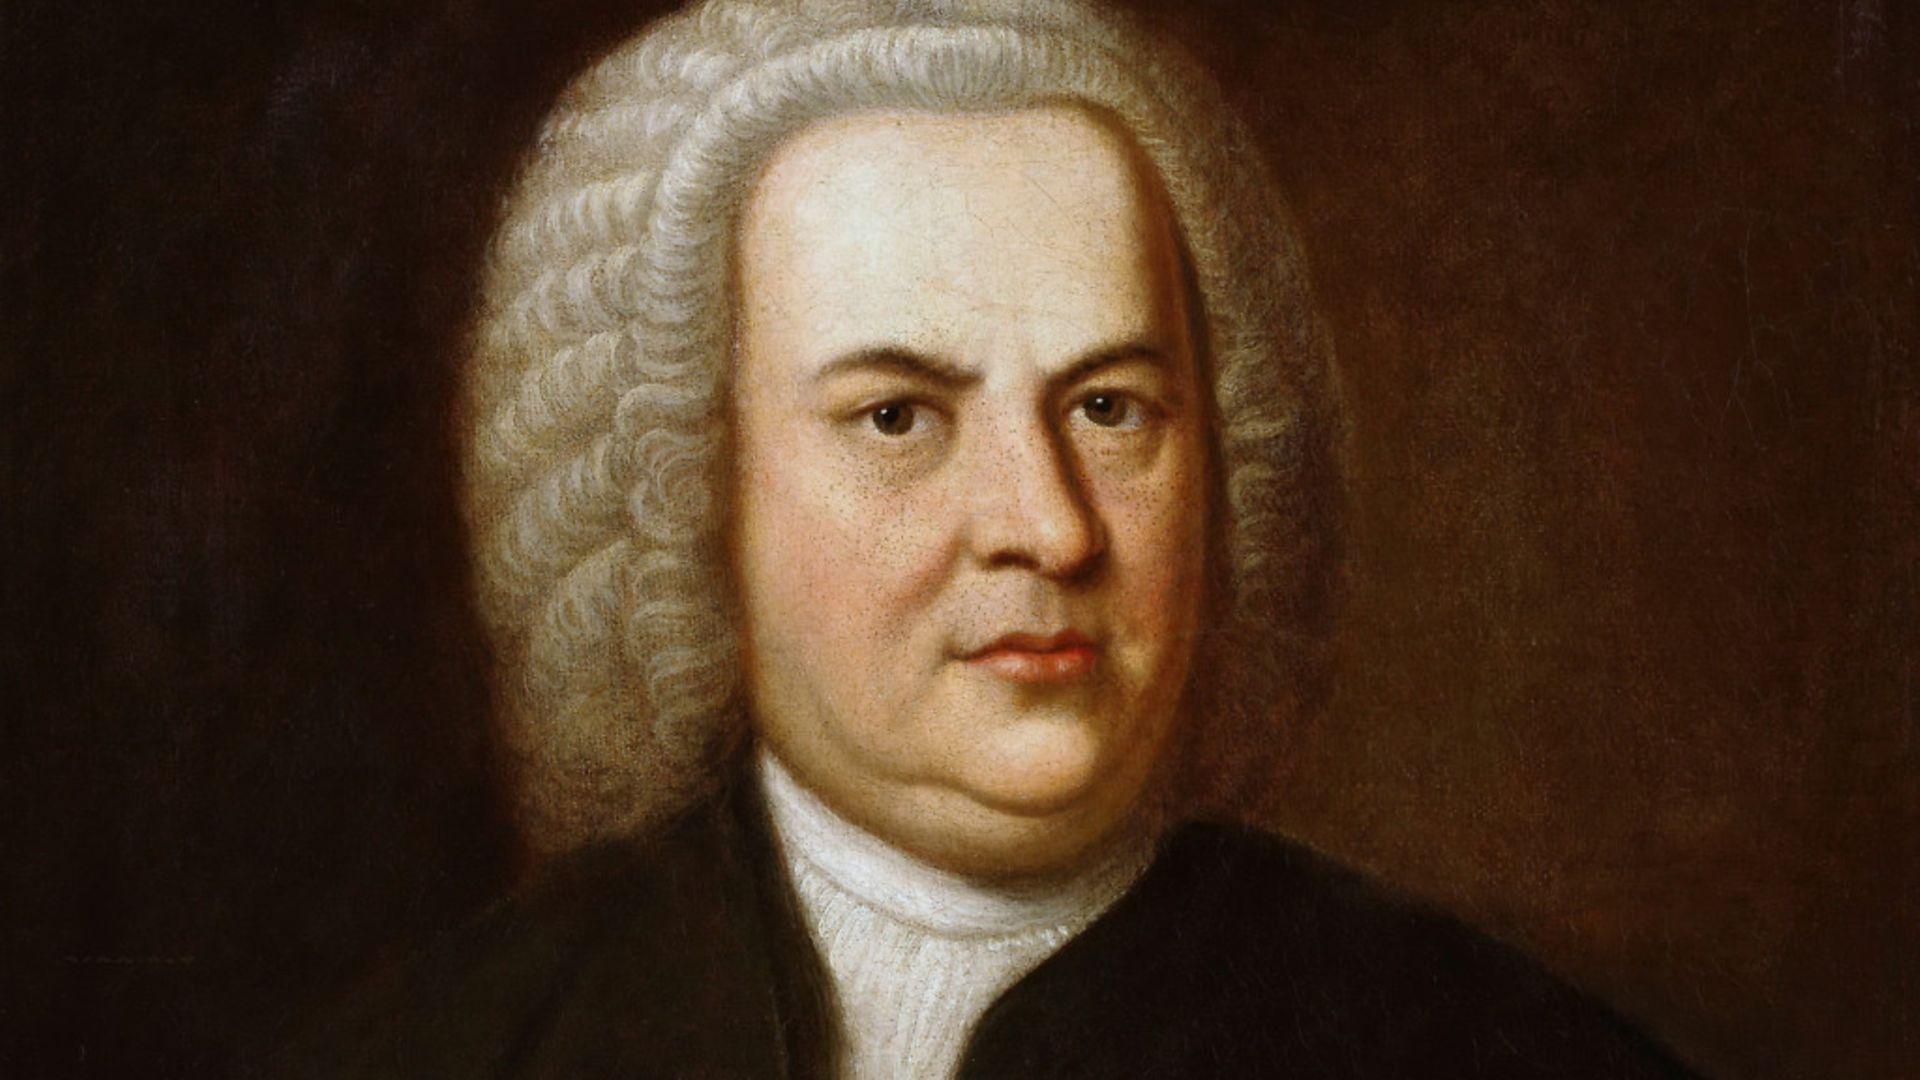 Portrait of Johann Sebastian Bach - Credit: Getty Images